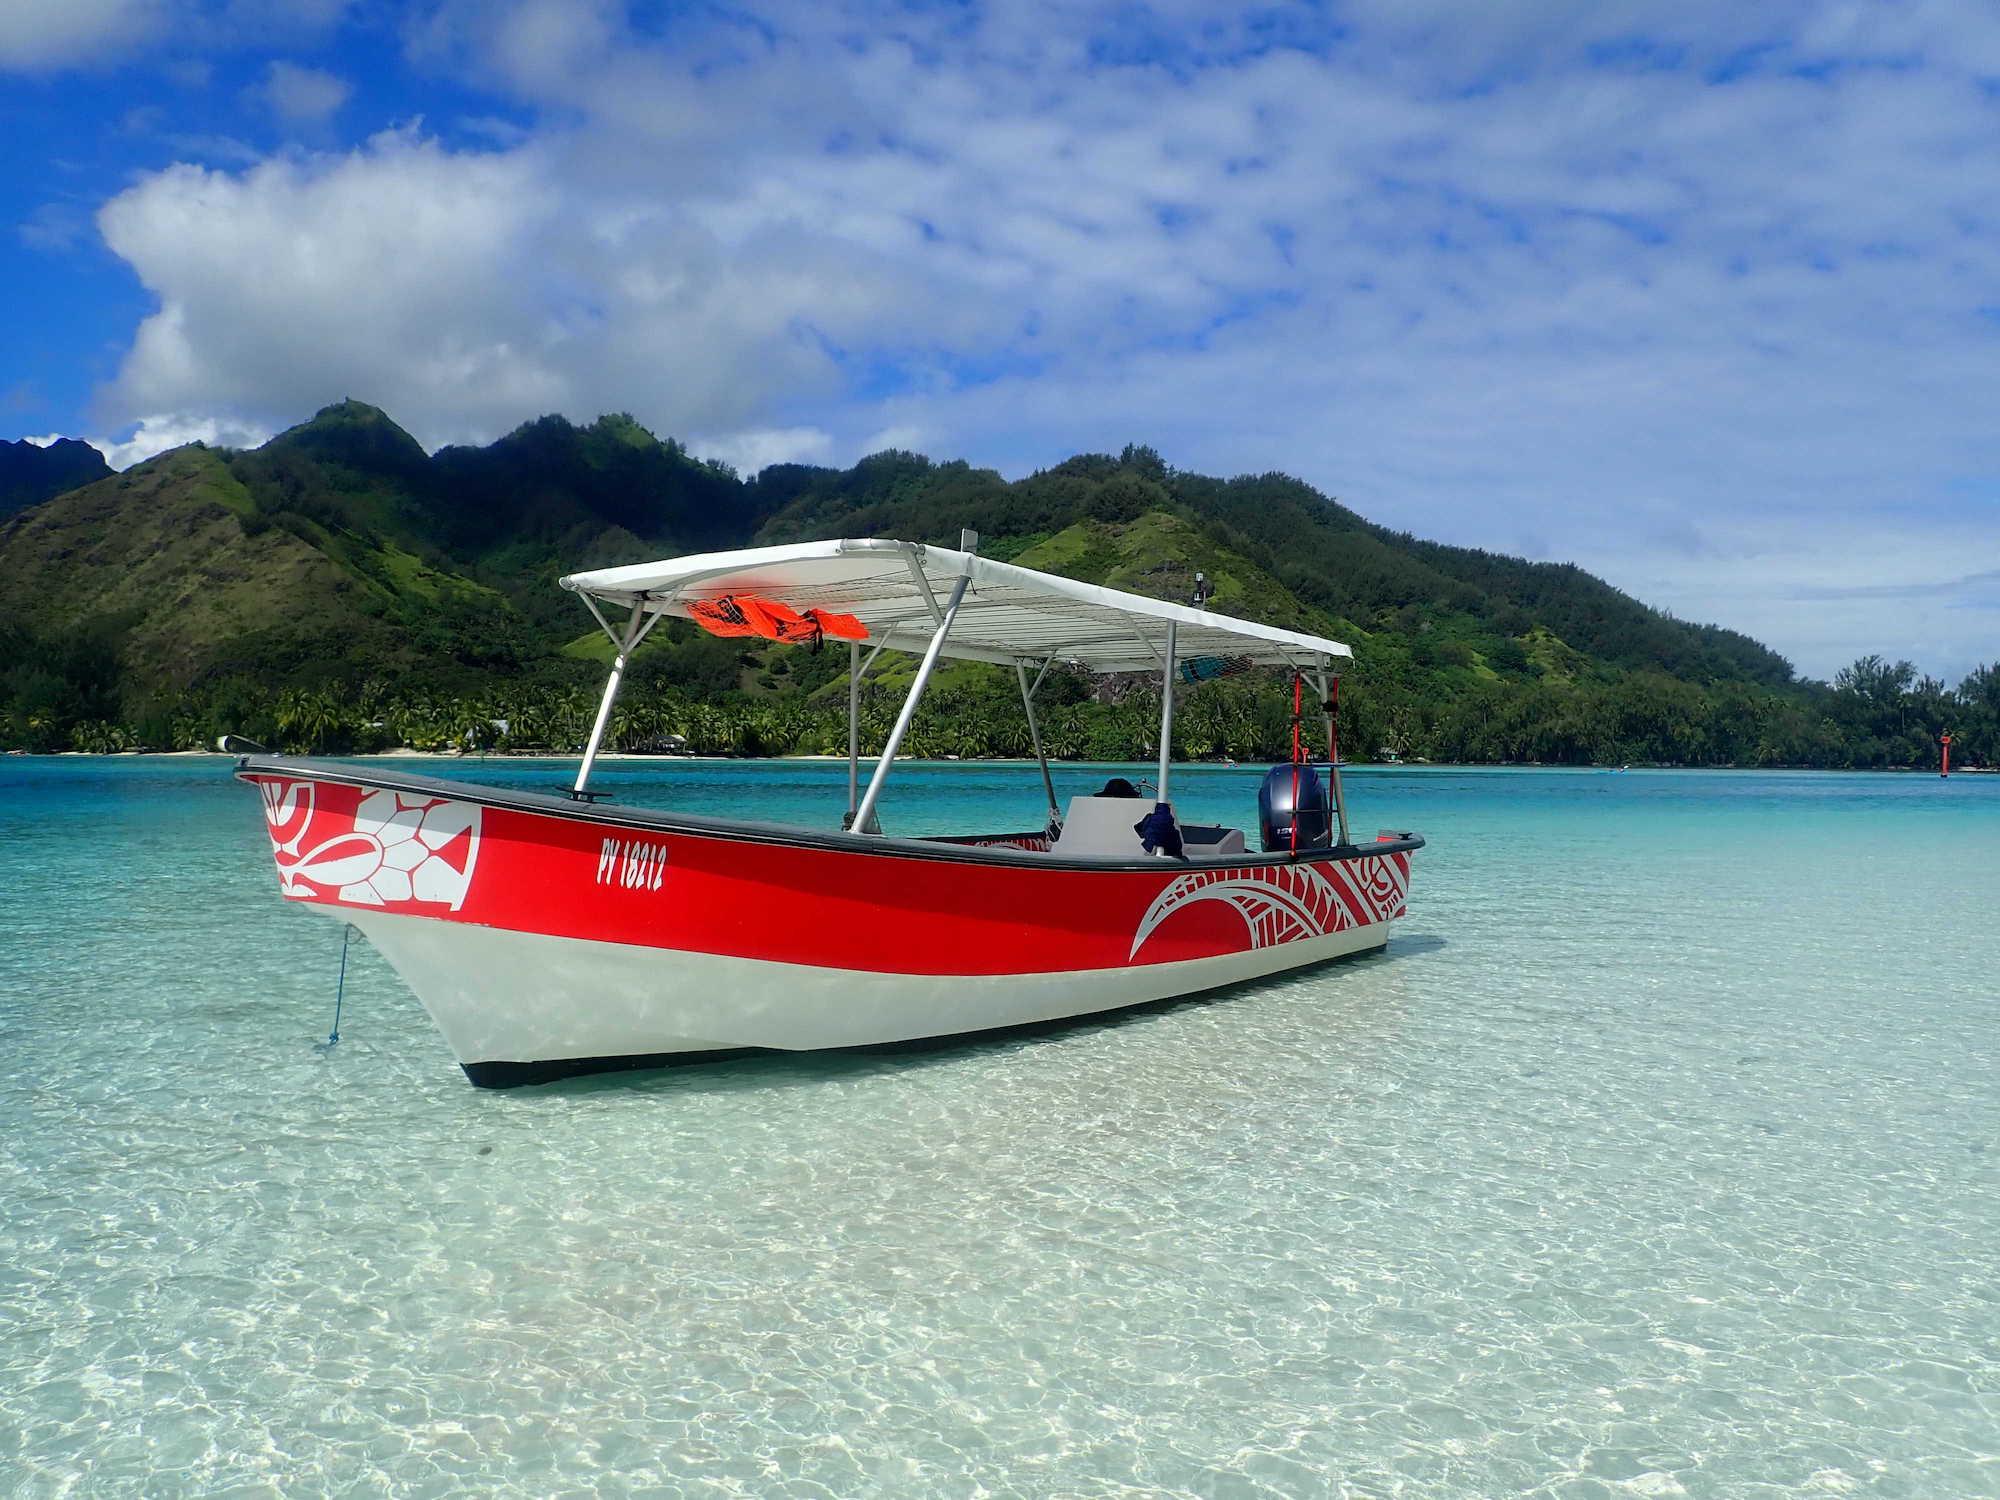 https://tahititourisme.it/wp-content/uploads/2020/09/Boat-Hinaloa.jpg